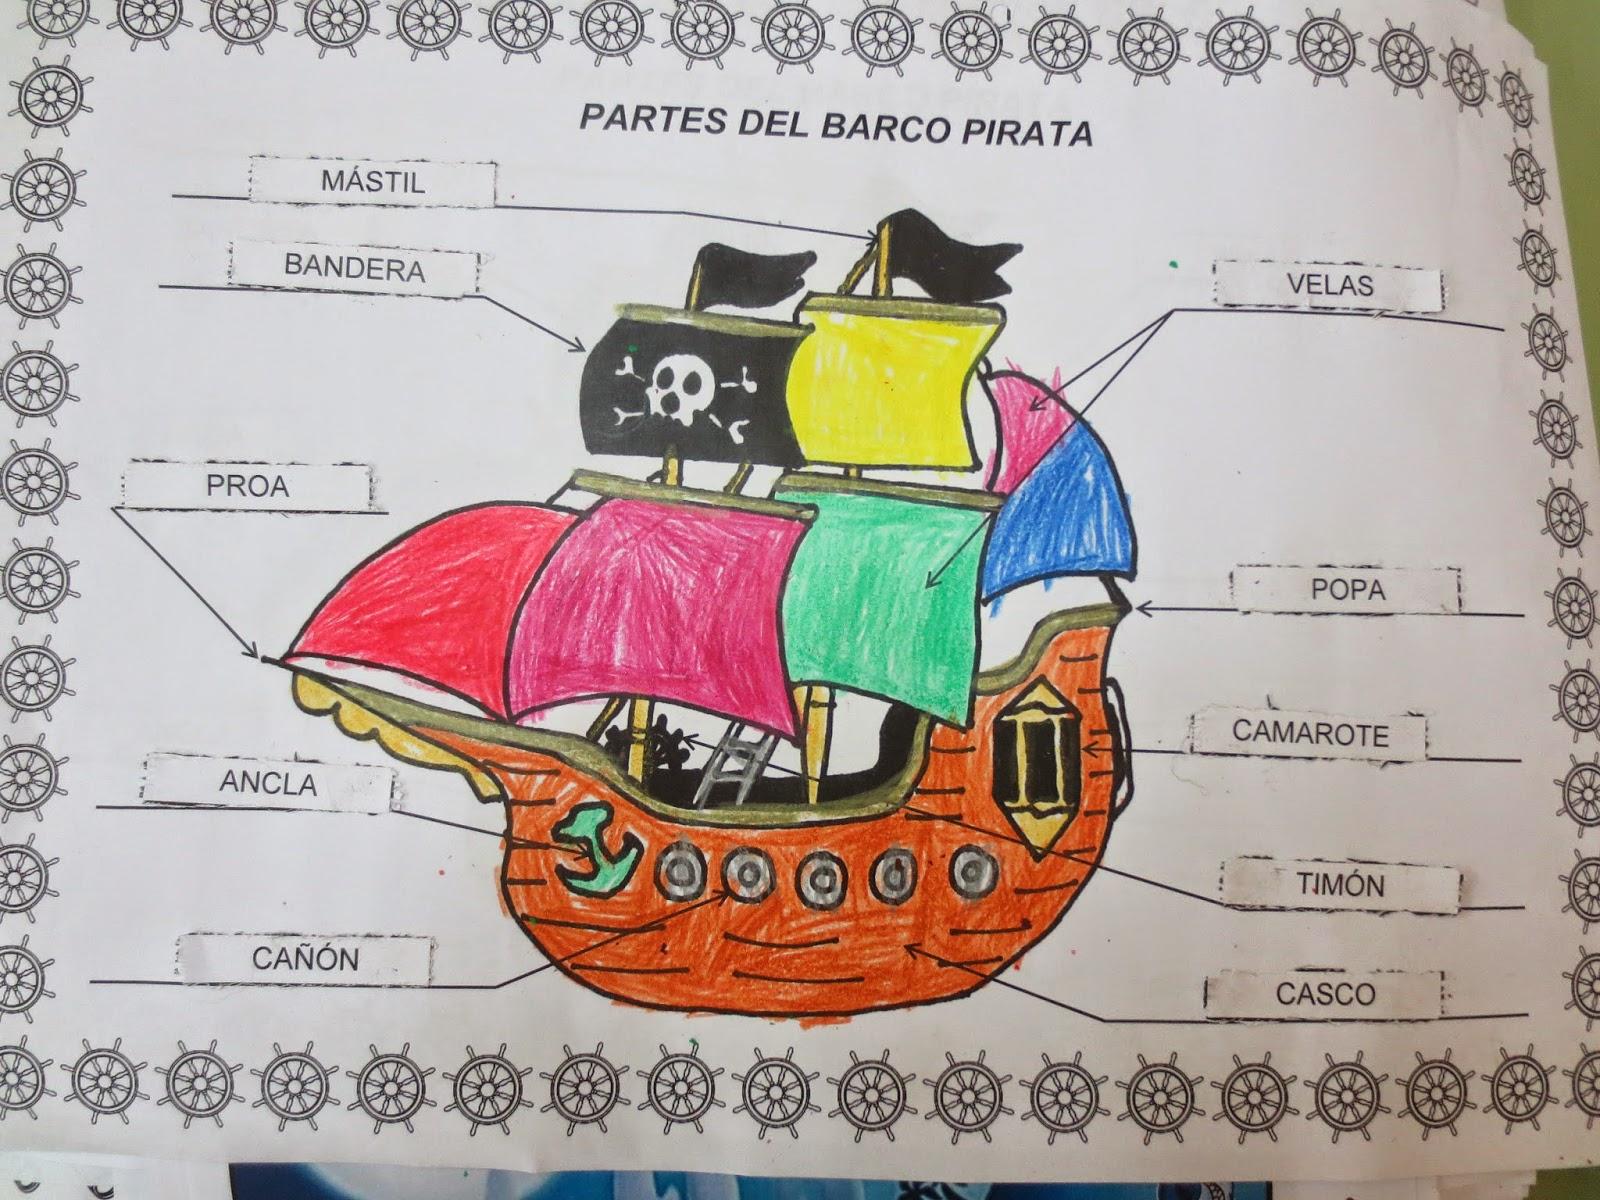 Infantil jos mar a de pereda los piratas the pirates - Imagenes de barcos infantiles ...